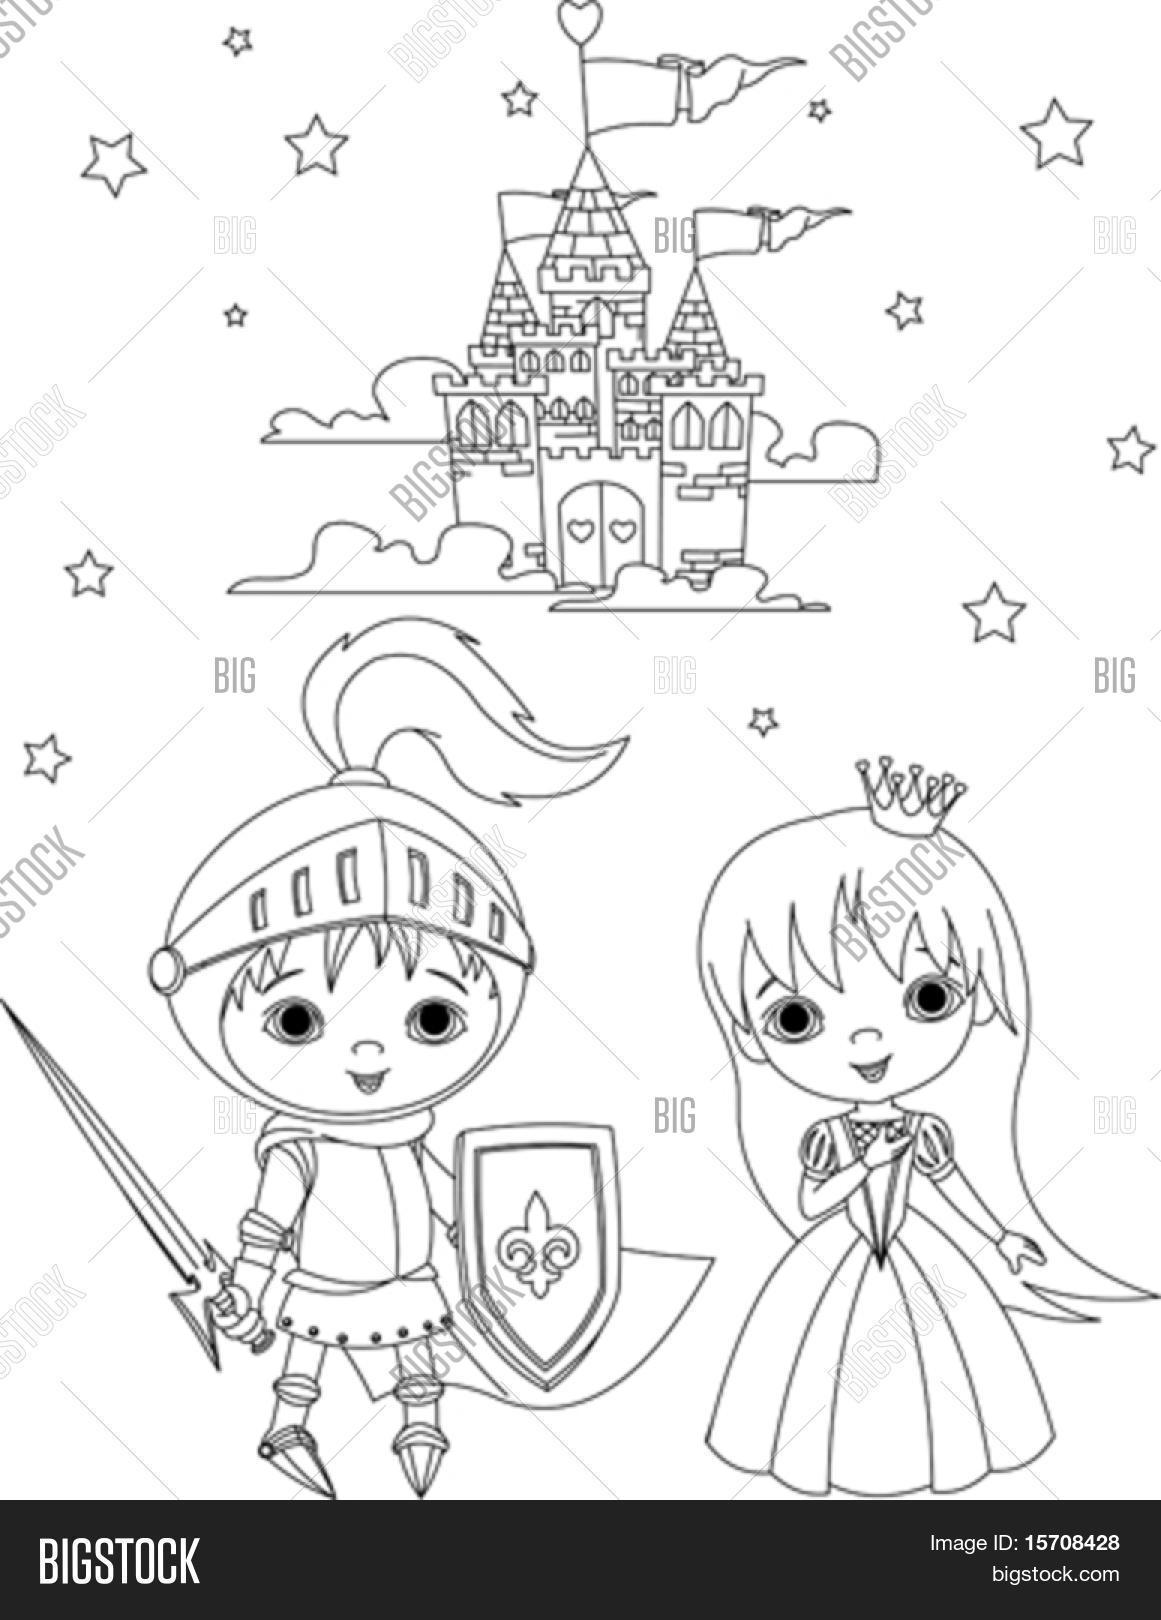 Kleurplaten Prinsessen En Ridders.Kleurplaat Ridder